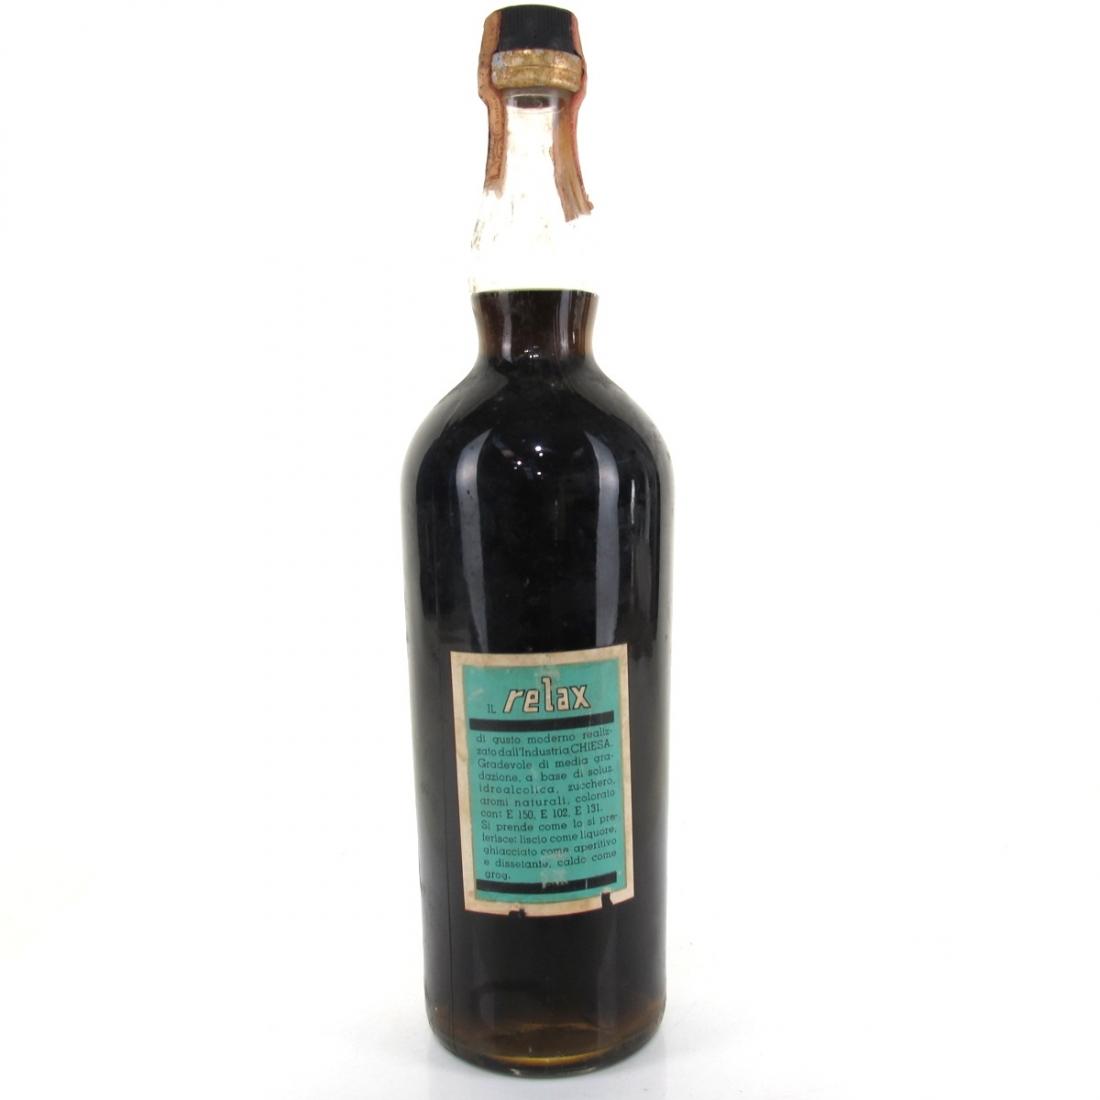 Relax Liquore 1 Litre 1950/60s